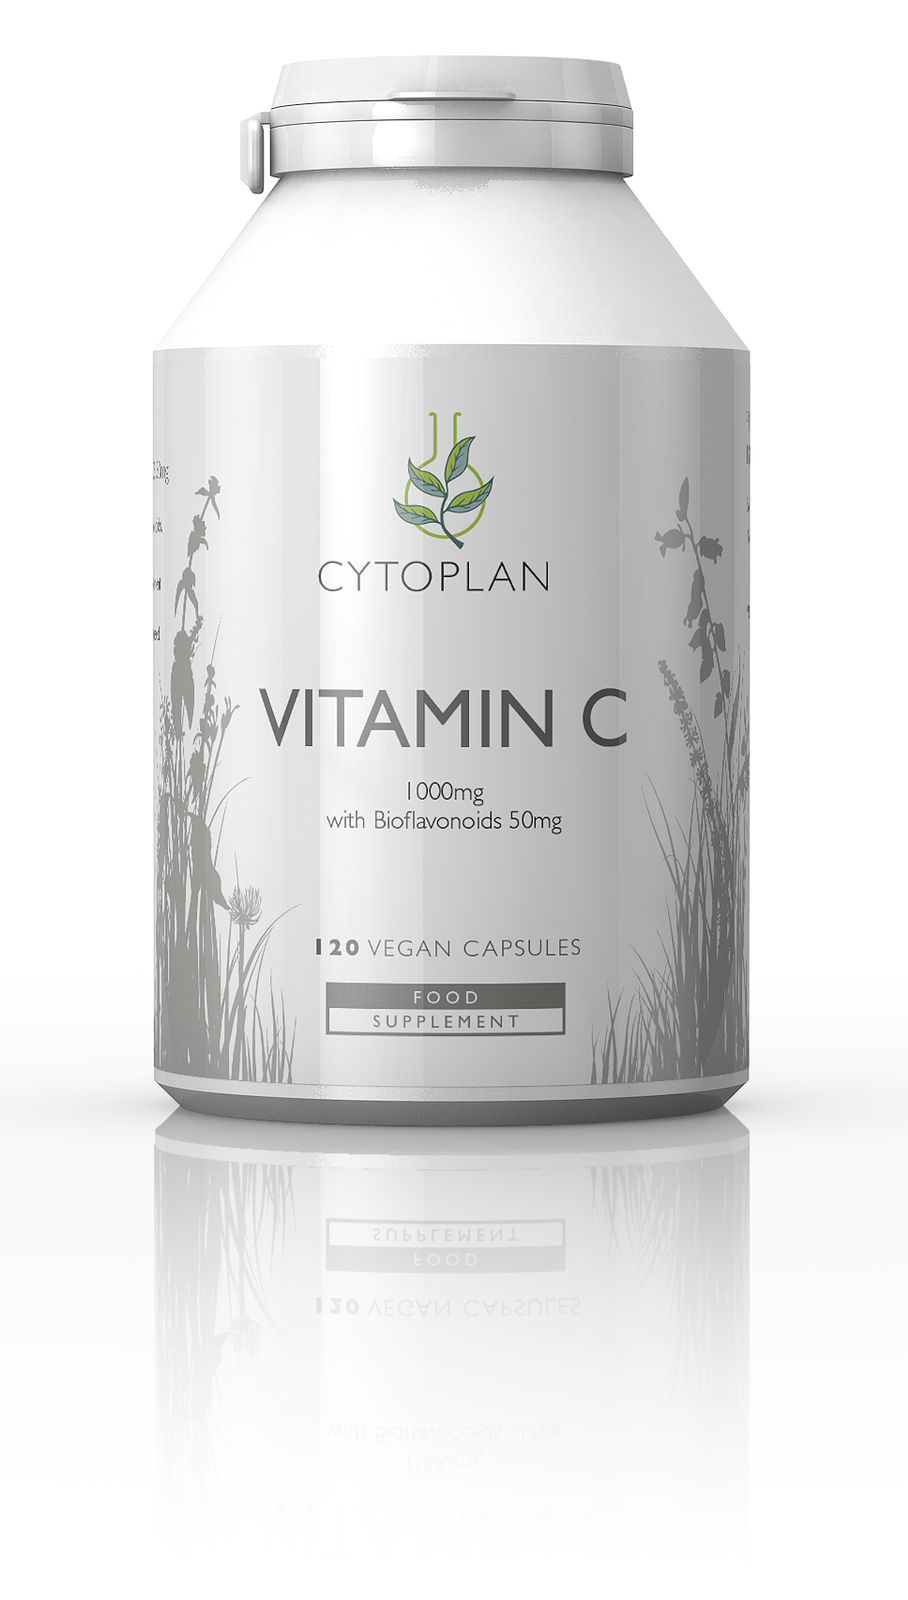 Vitamin C 1000mg with Bioflavanoids 50mg 120's